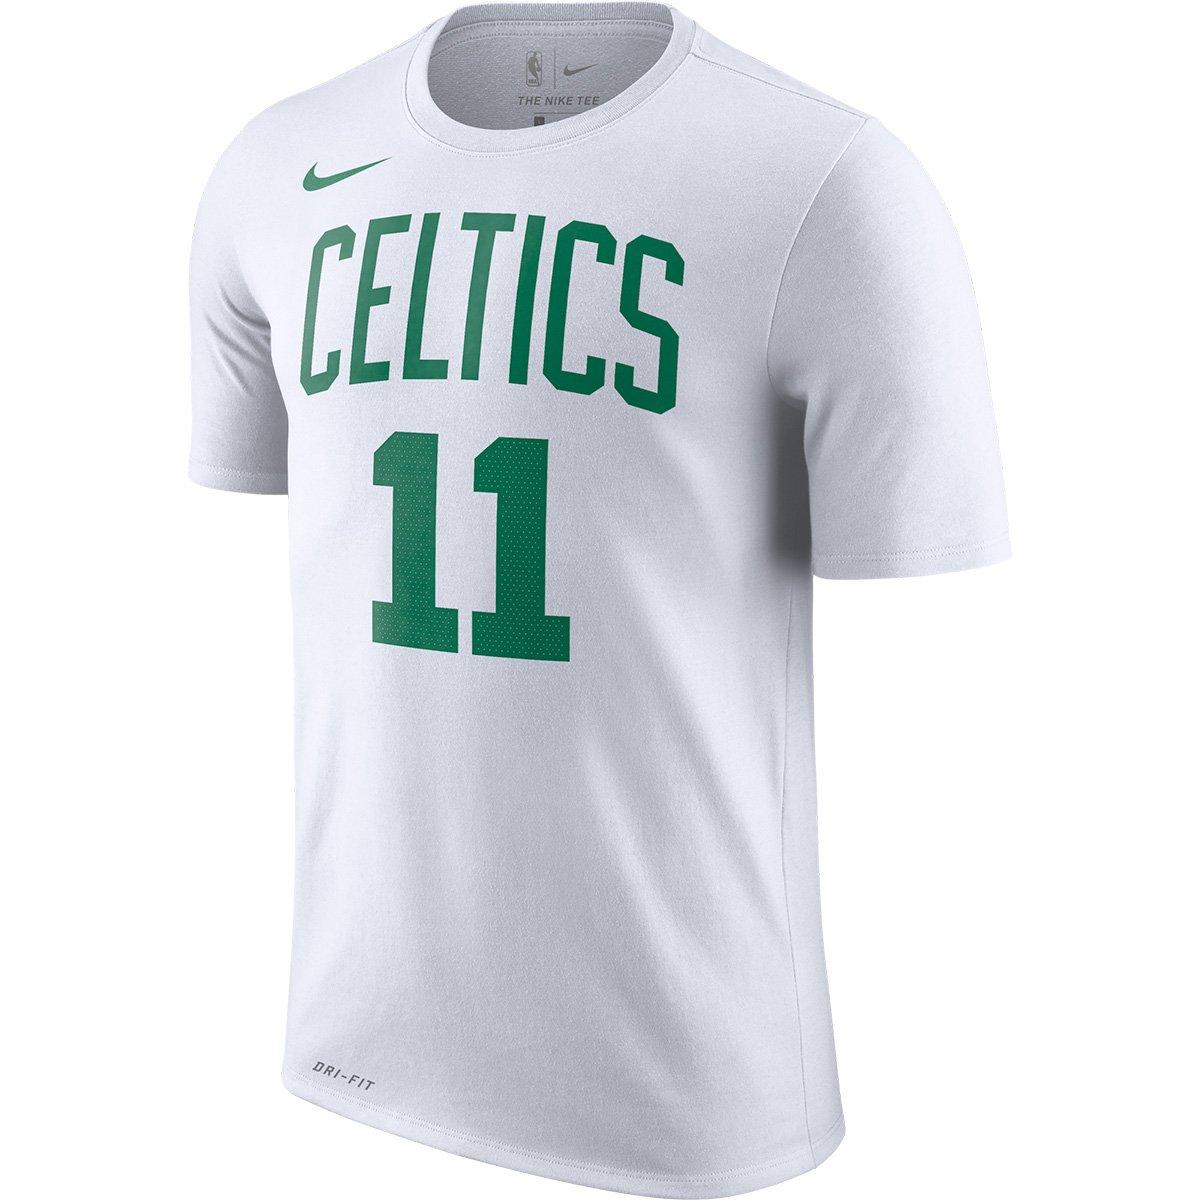 c267981d2 Camiseta NBA Boston Celtics Kyrie Irving Nike Dry 11 Masculina - Branco -  Compre Agora